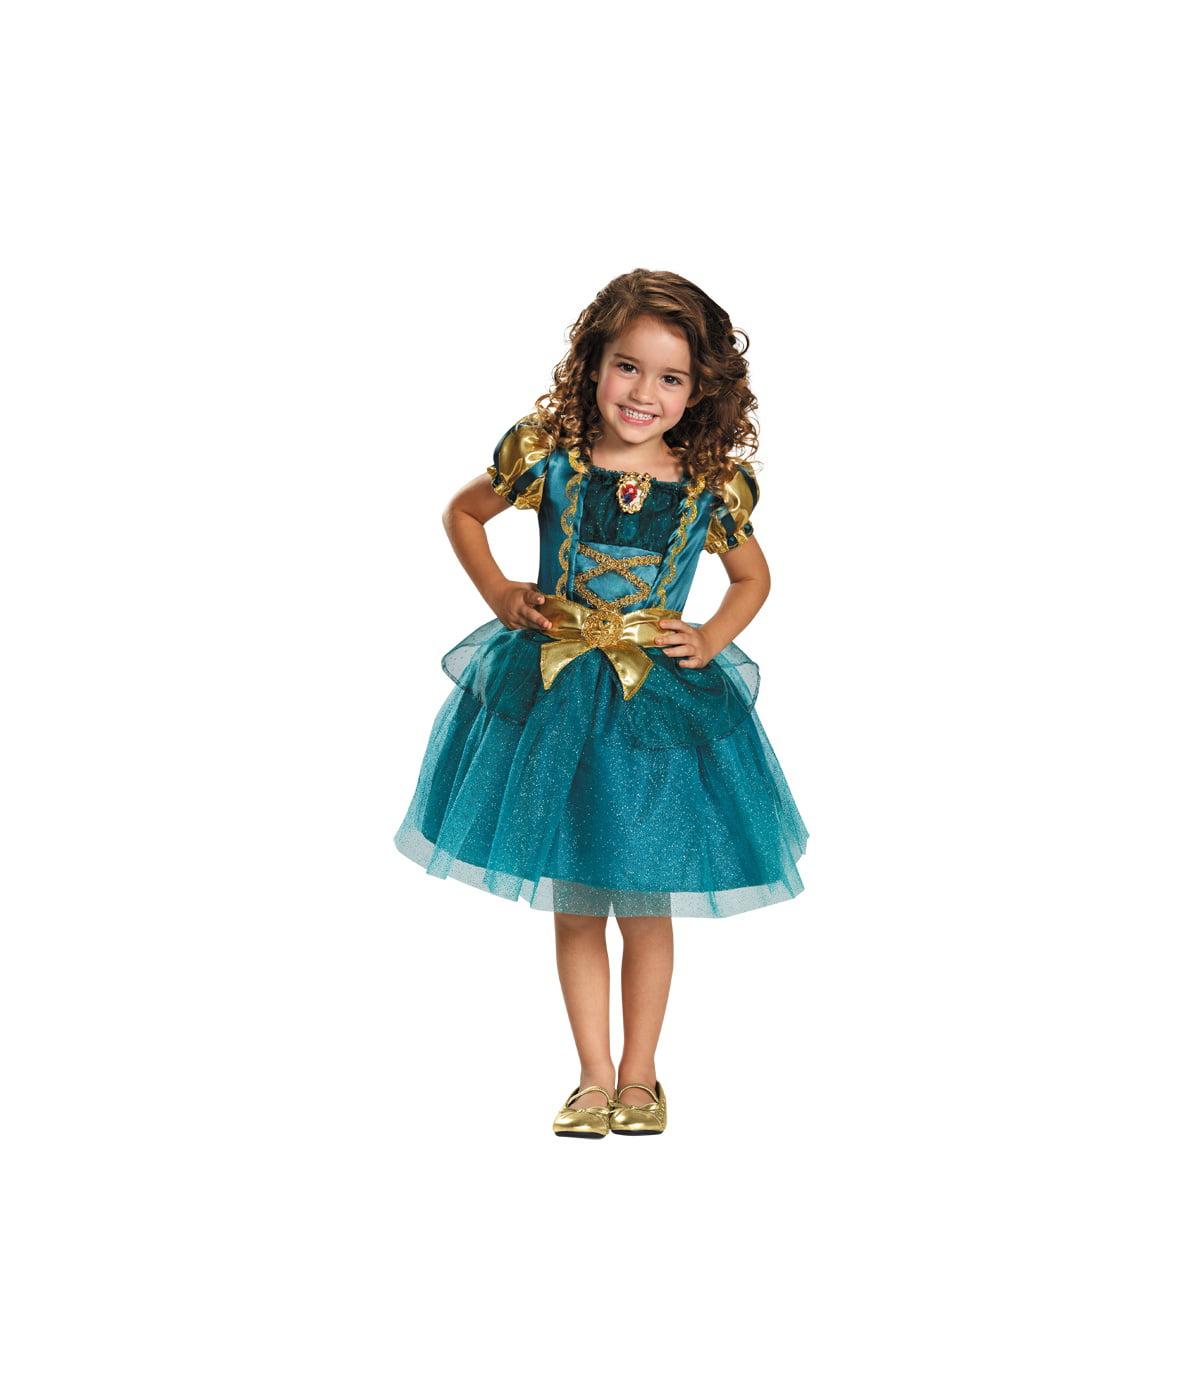 80608f99f6f1 Disney s Brave Princess Merida Little Girls Costume - Walmart.com